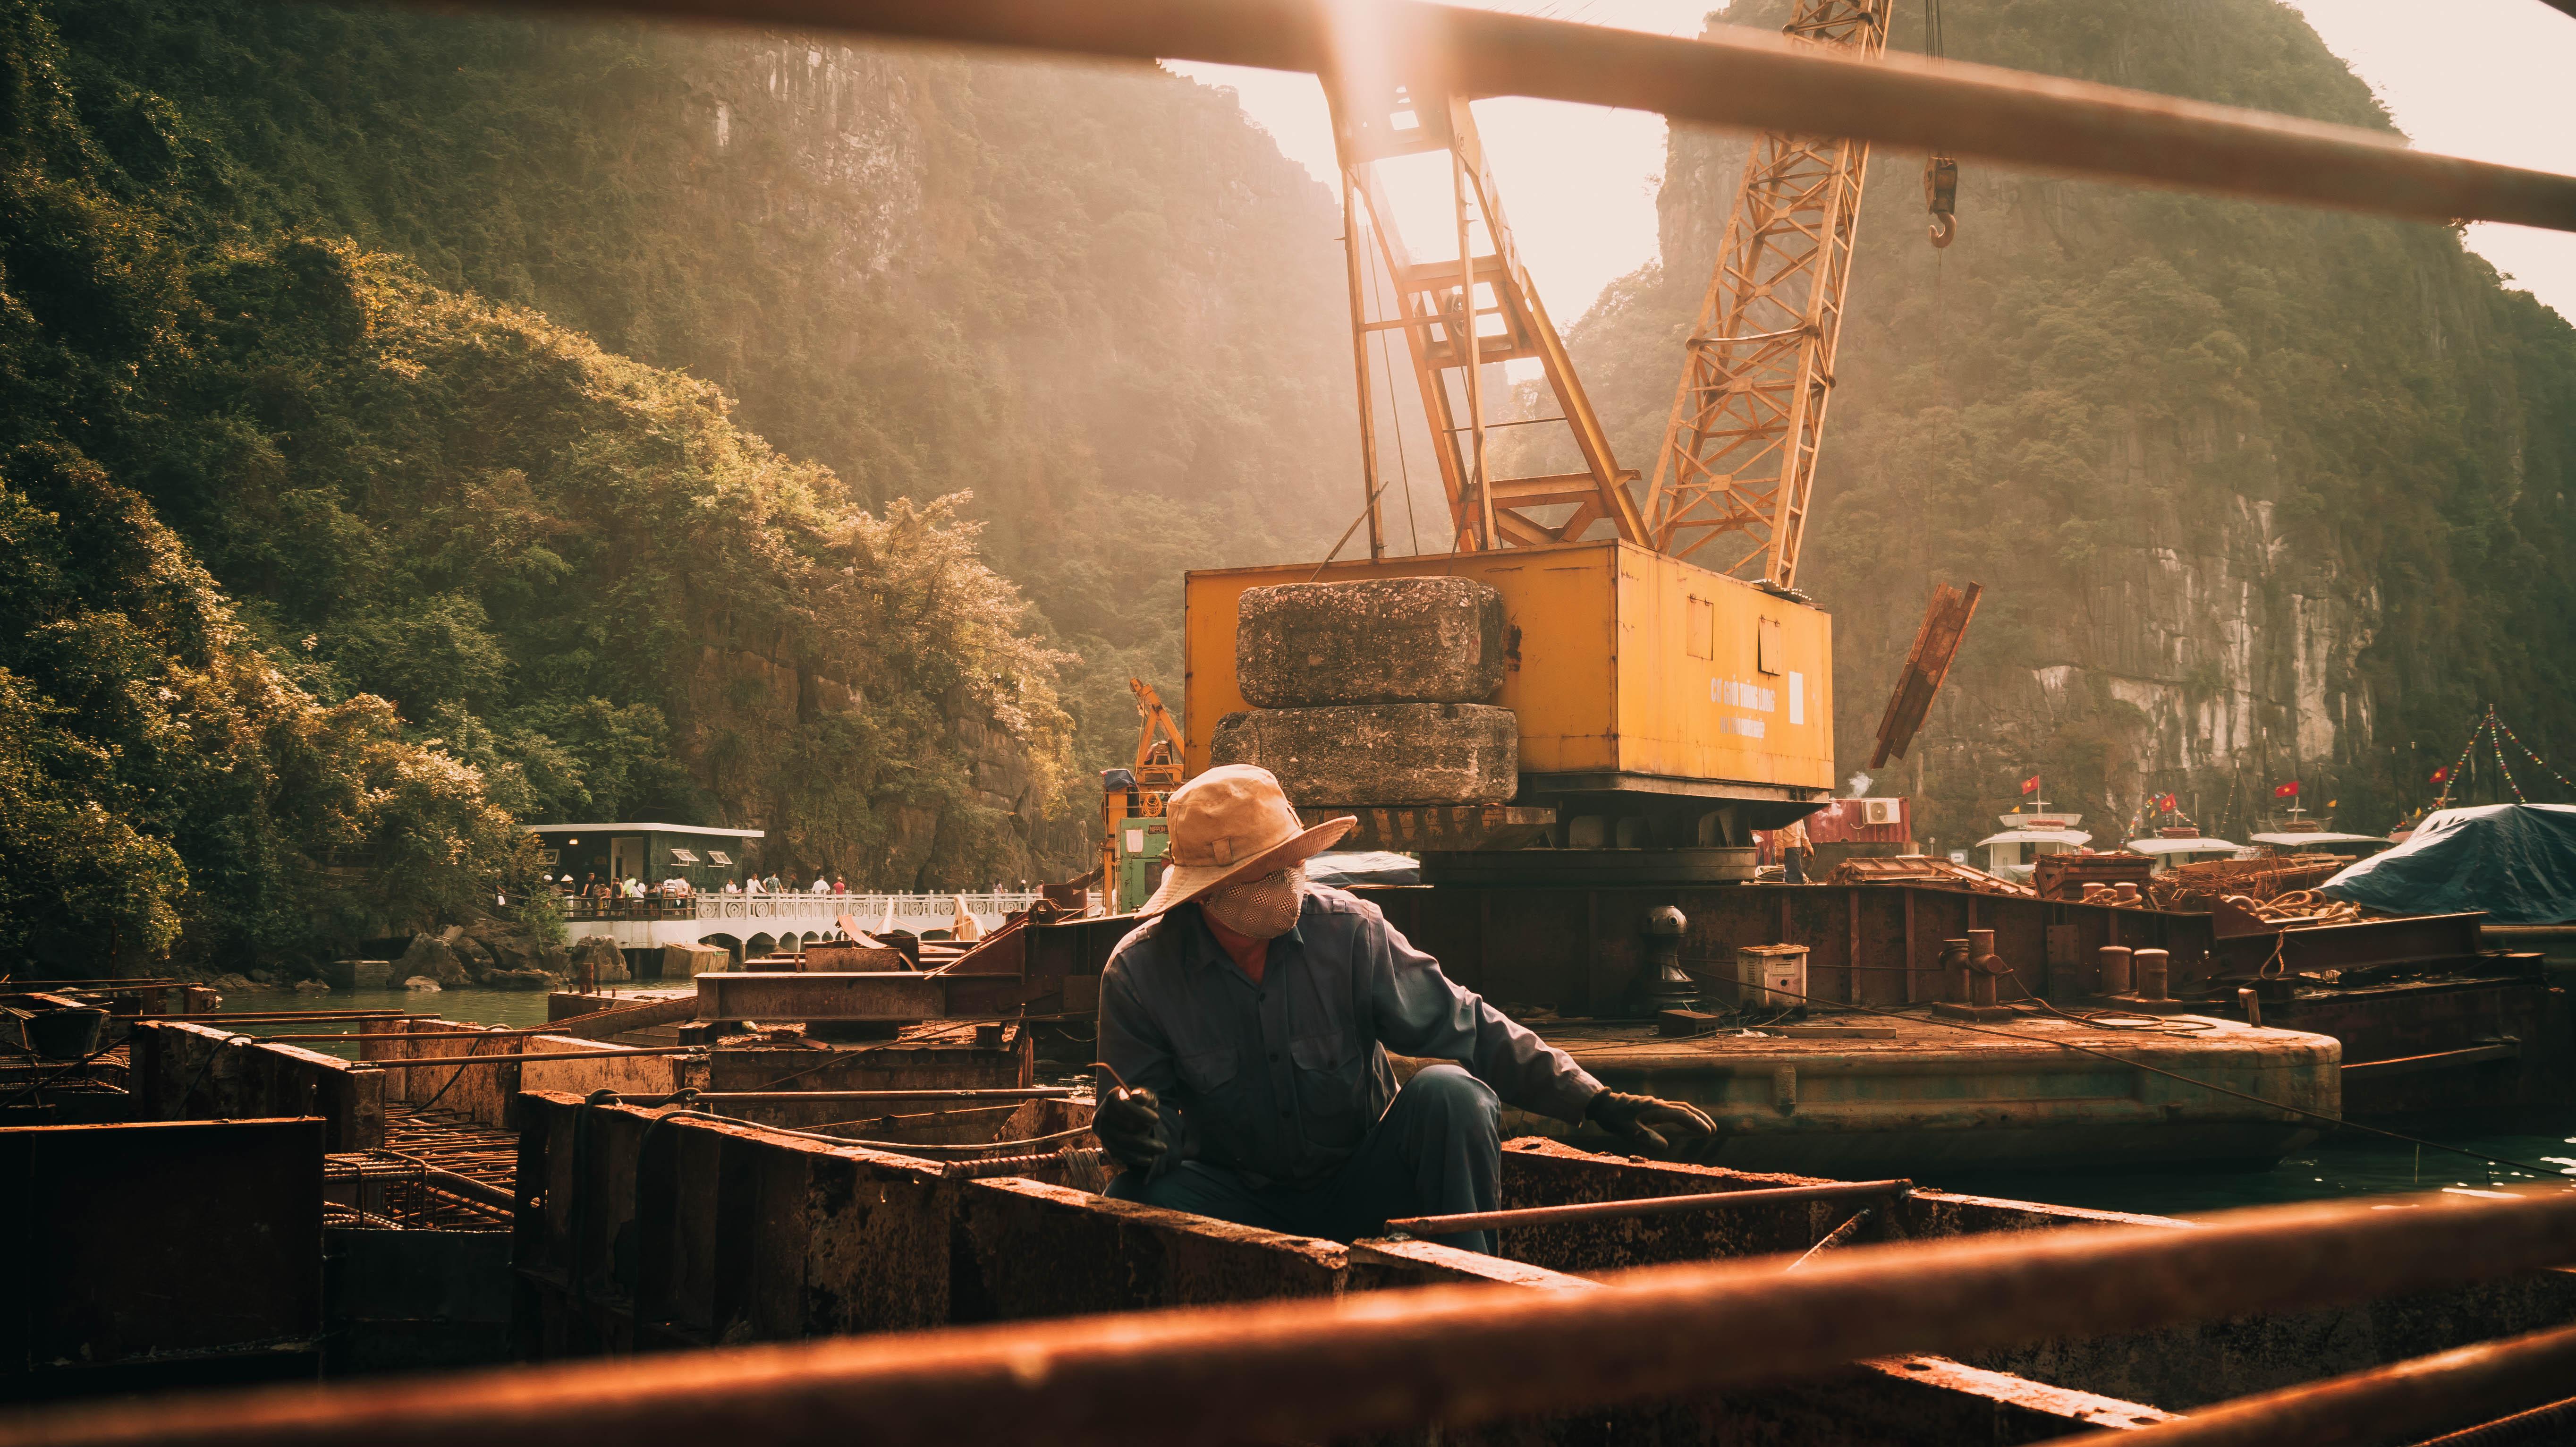 sun hats sun rays Vietnam workers cranes machine mountains Halong Bay  construction site men Asia 6ba7a0fd1b4